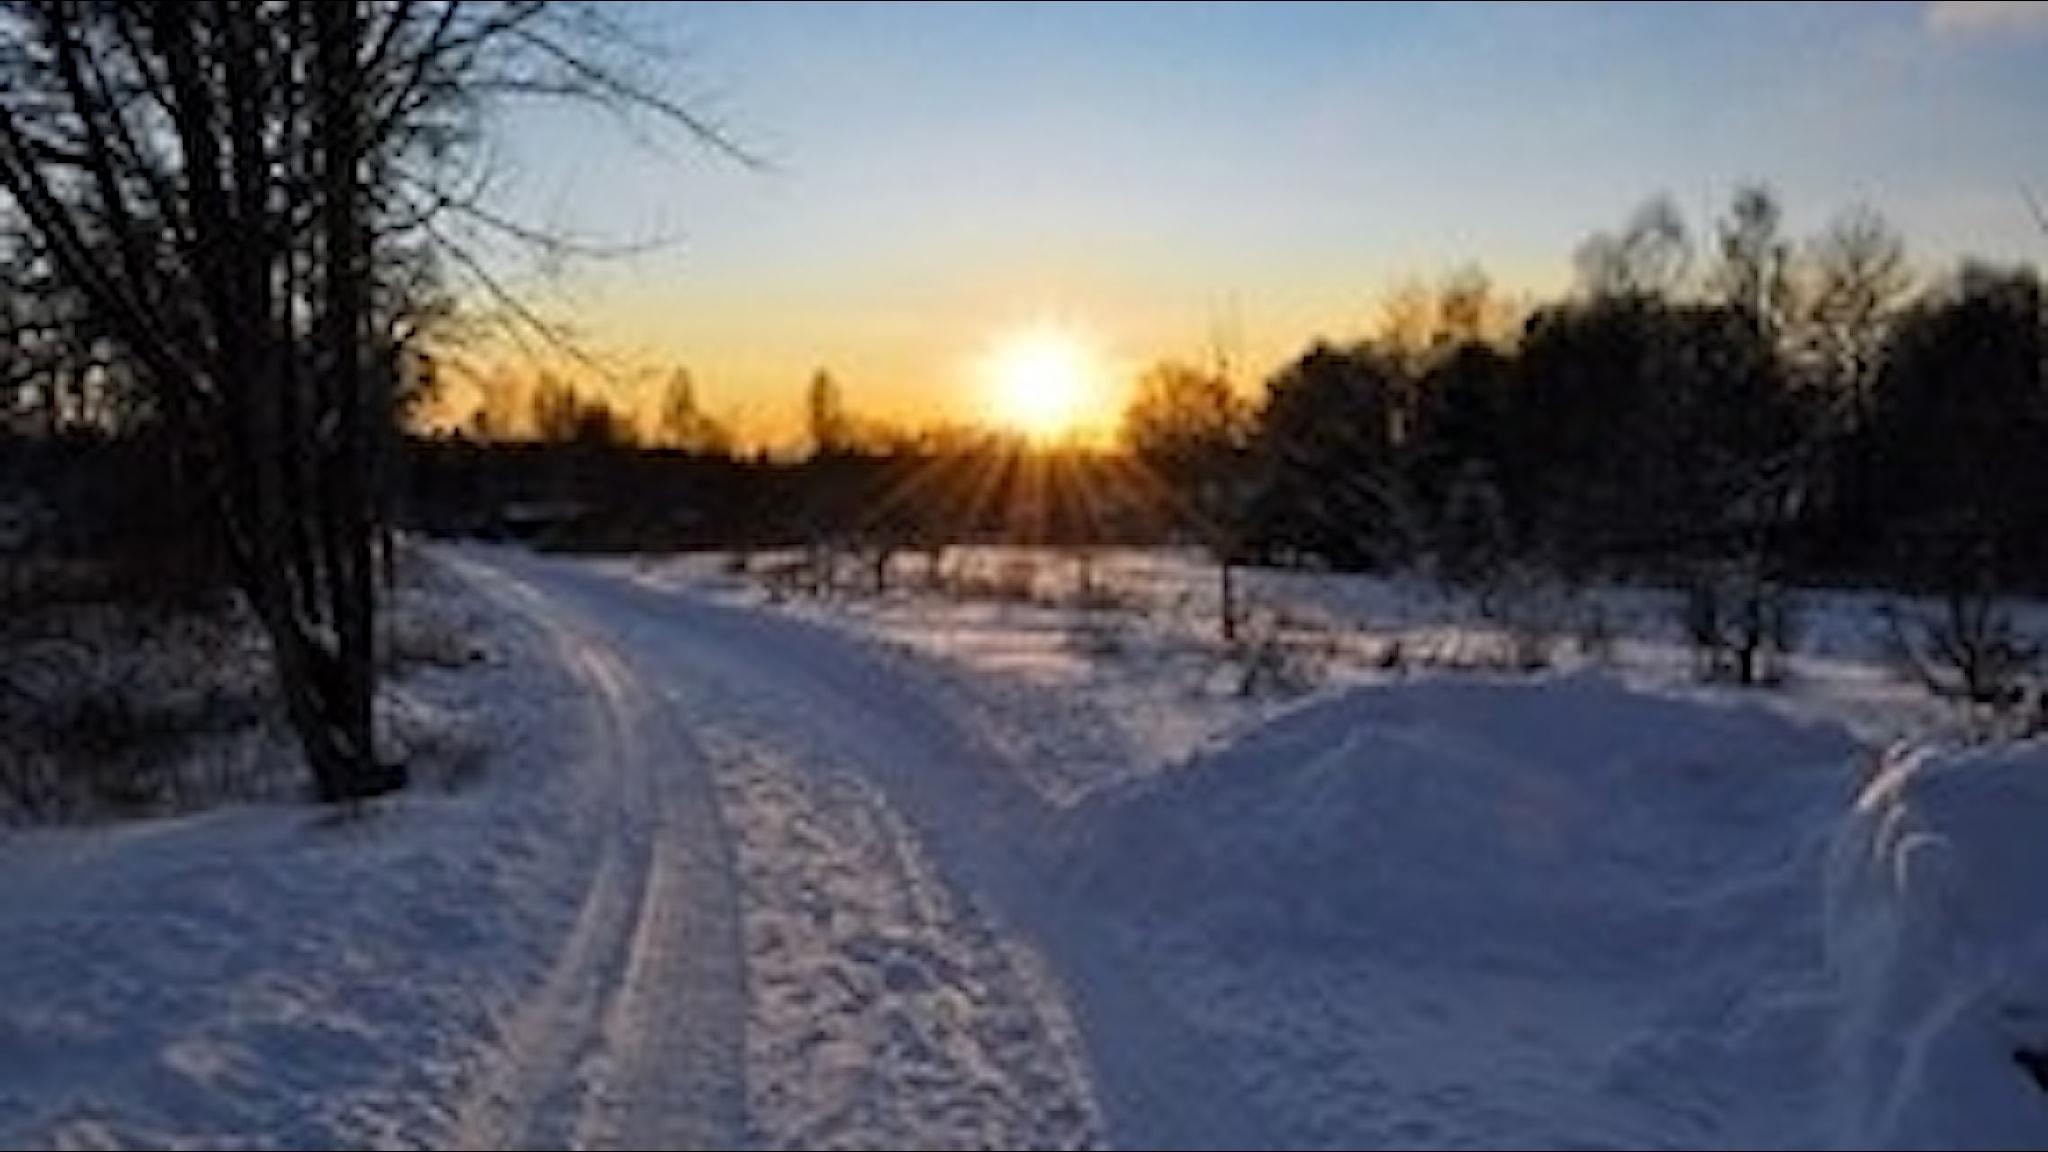 Soluppgång en vintermorgon.